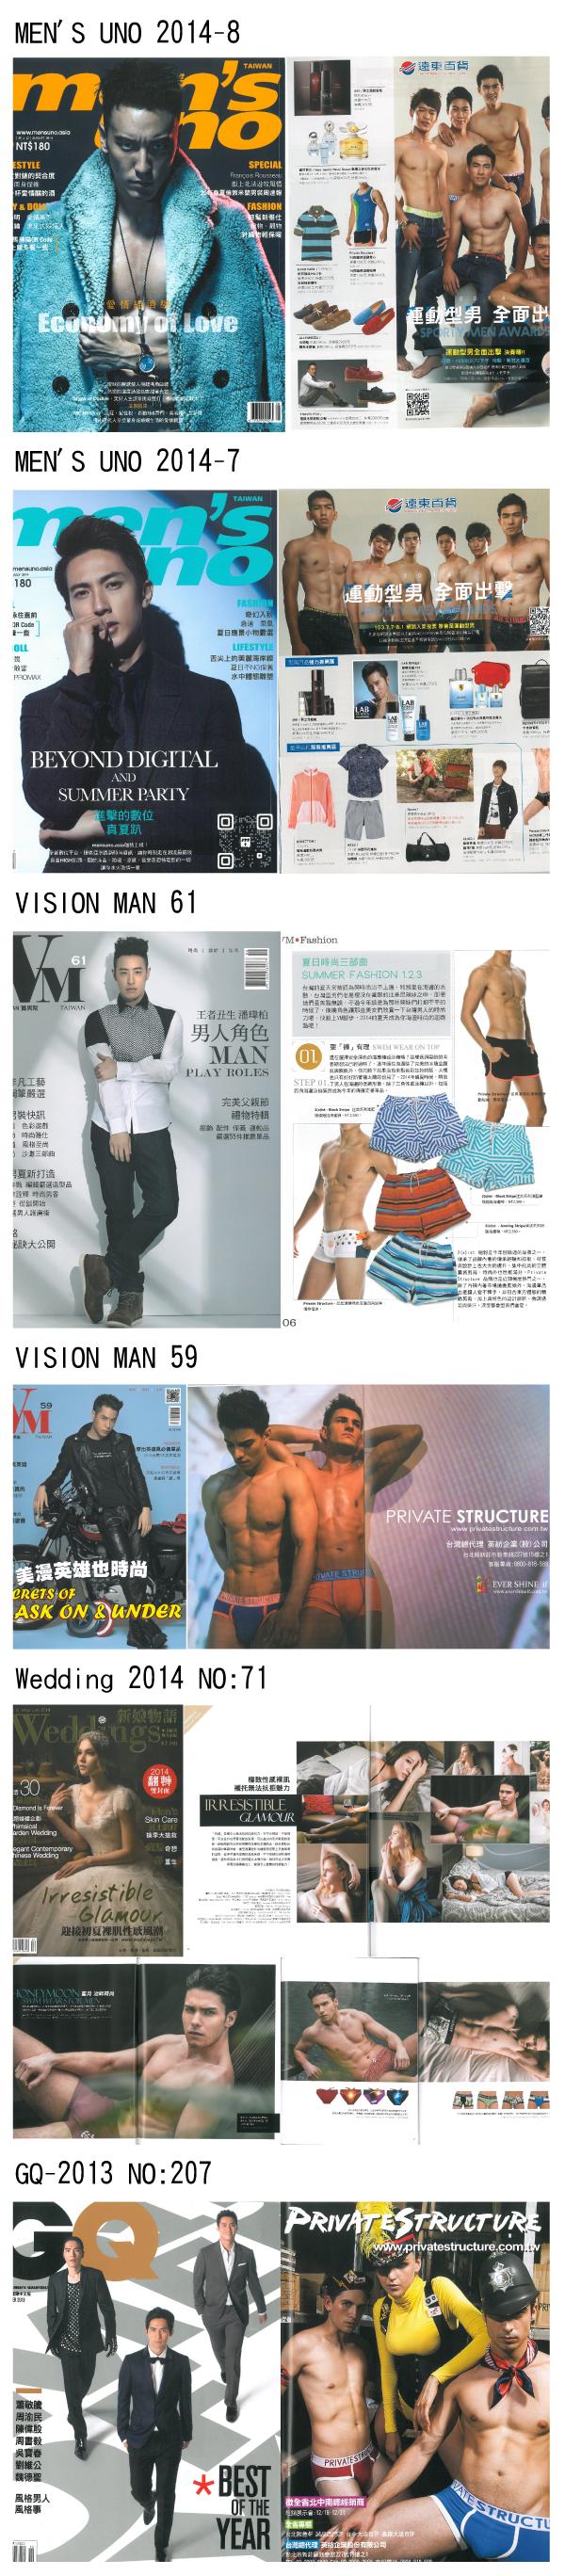 http://www.momoshop.com.tw/expertimg/0003/737/828/ps-magazine.jpg?t=1448902254